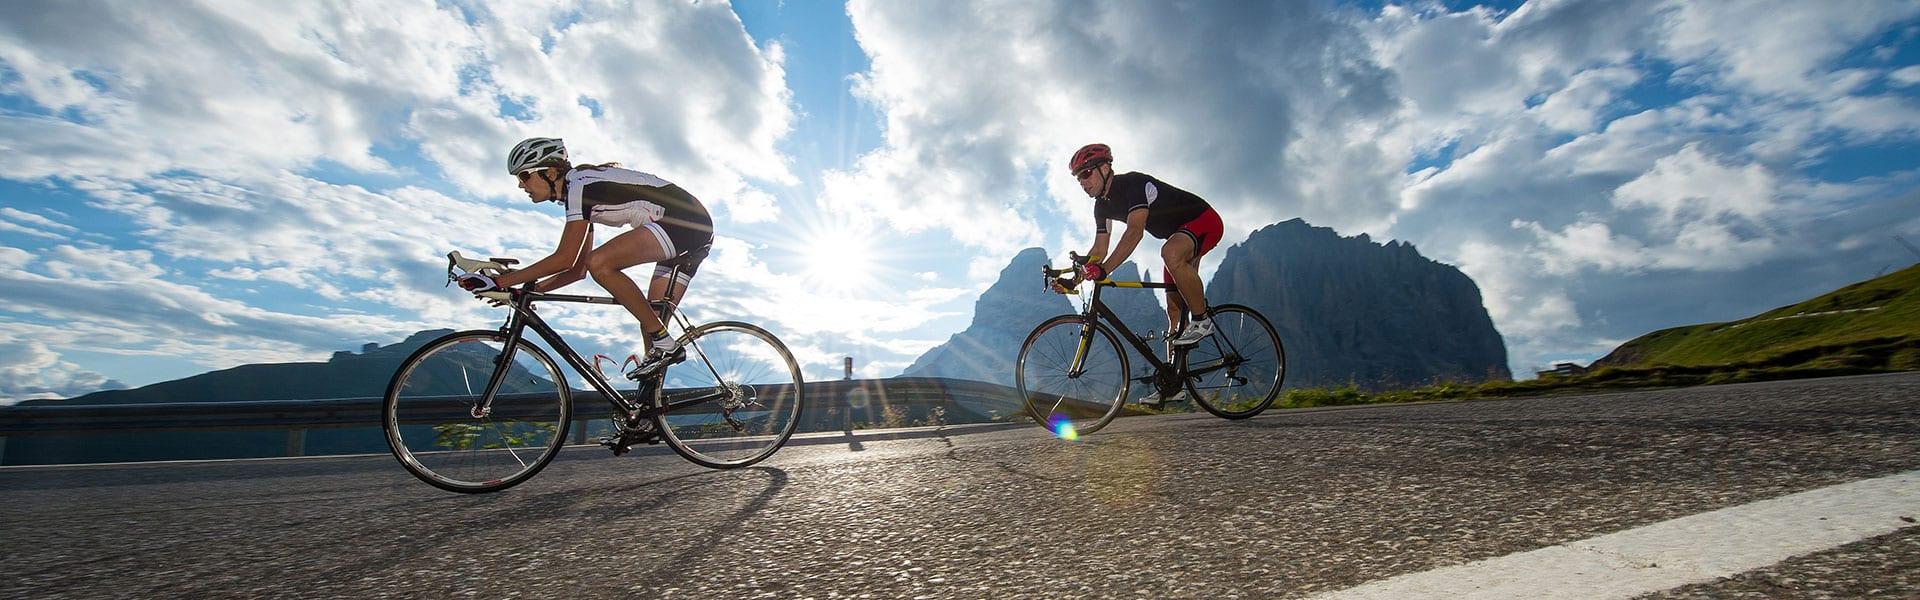 Roadbiken im Salzburger Land